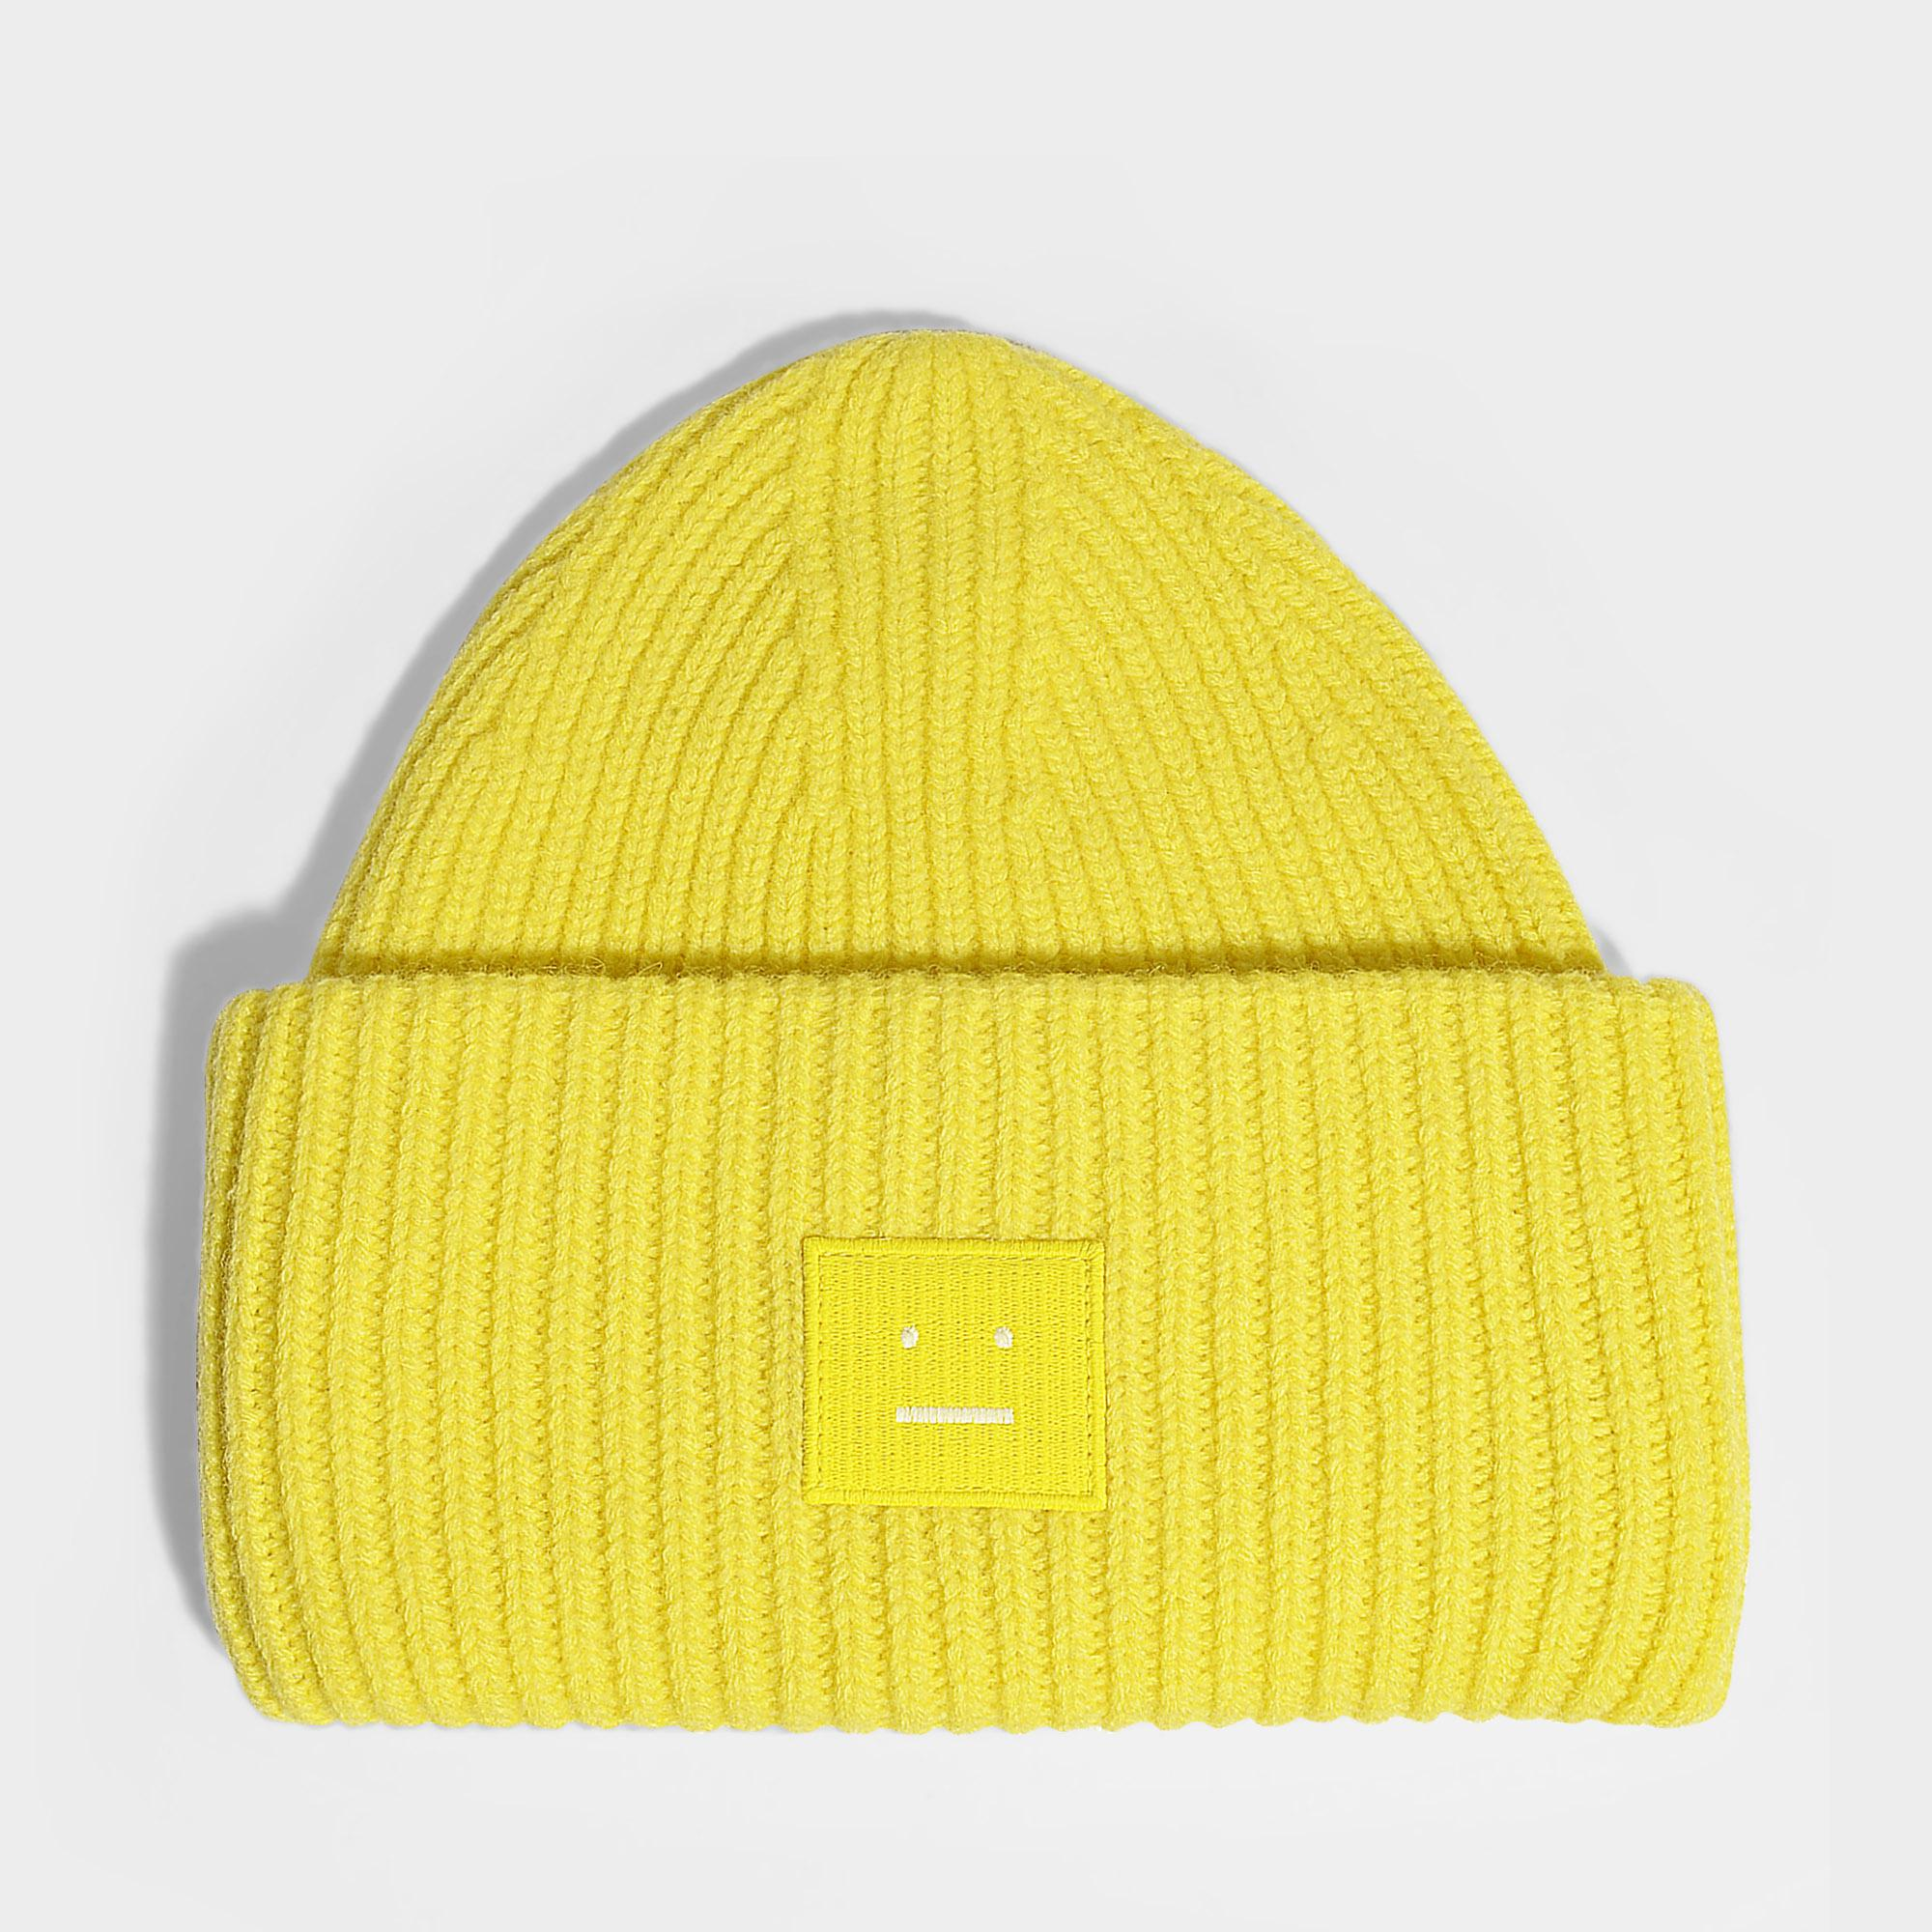 428b4190033 Lyst - Acne Studios Mütze Pansy N Face aus gelber Wolle in Gelb